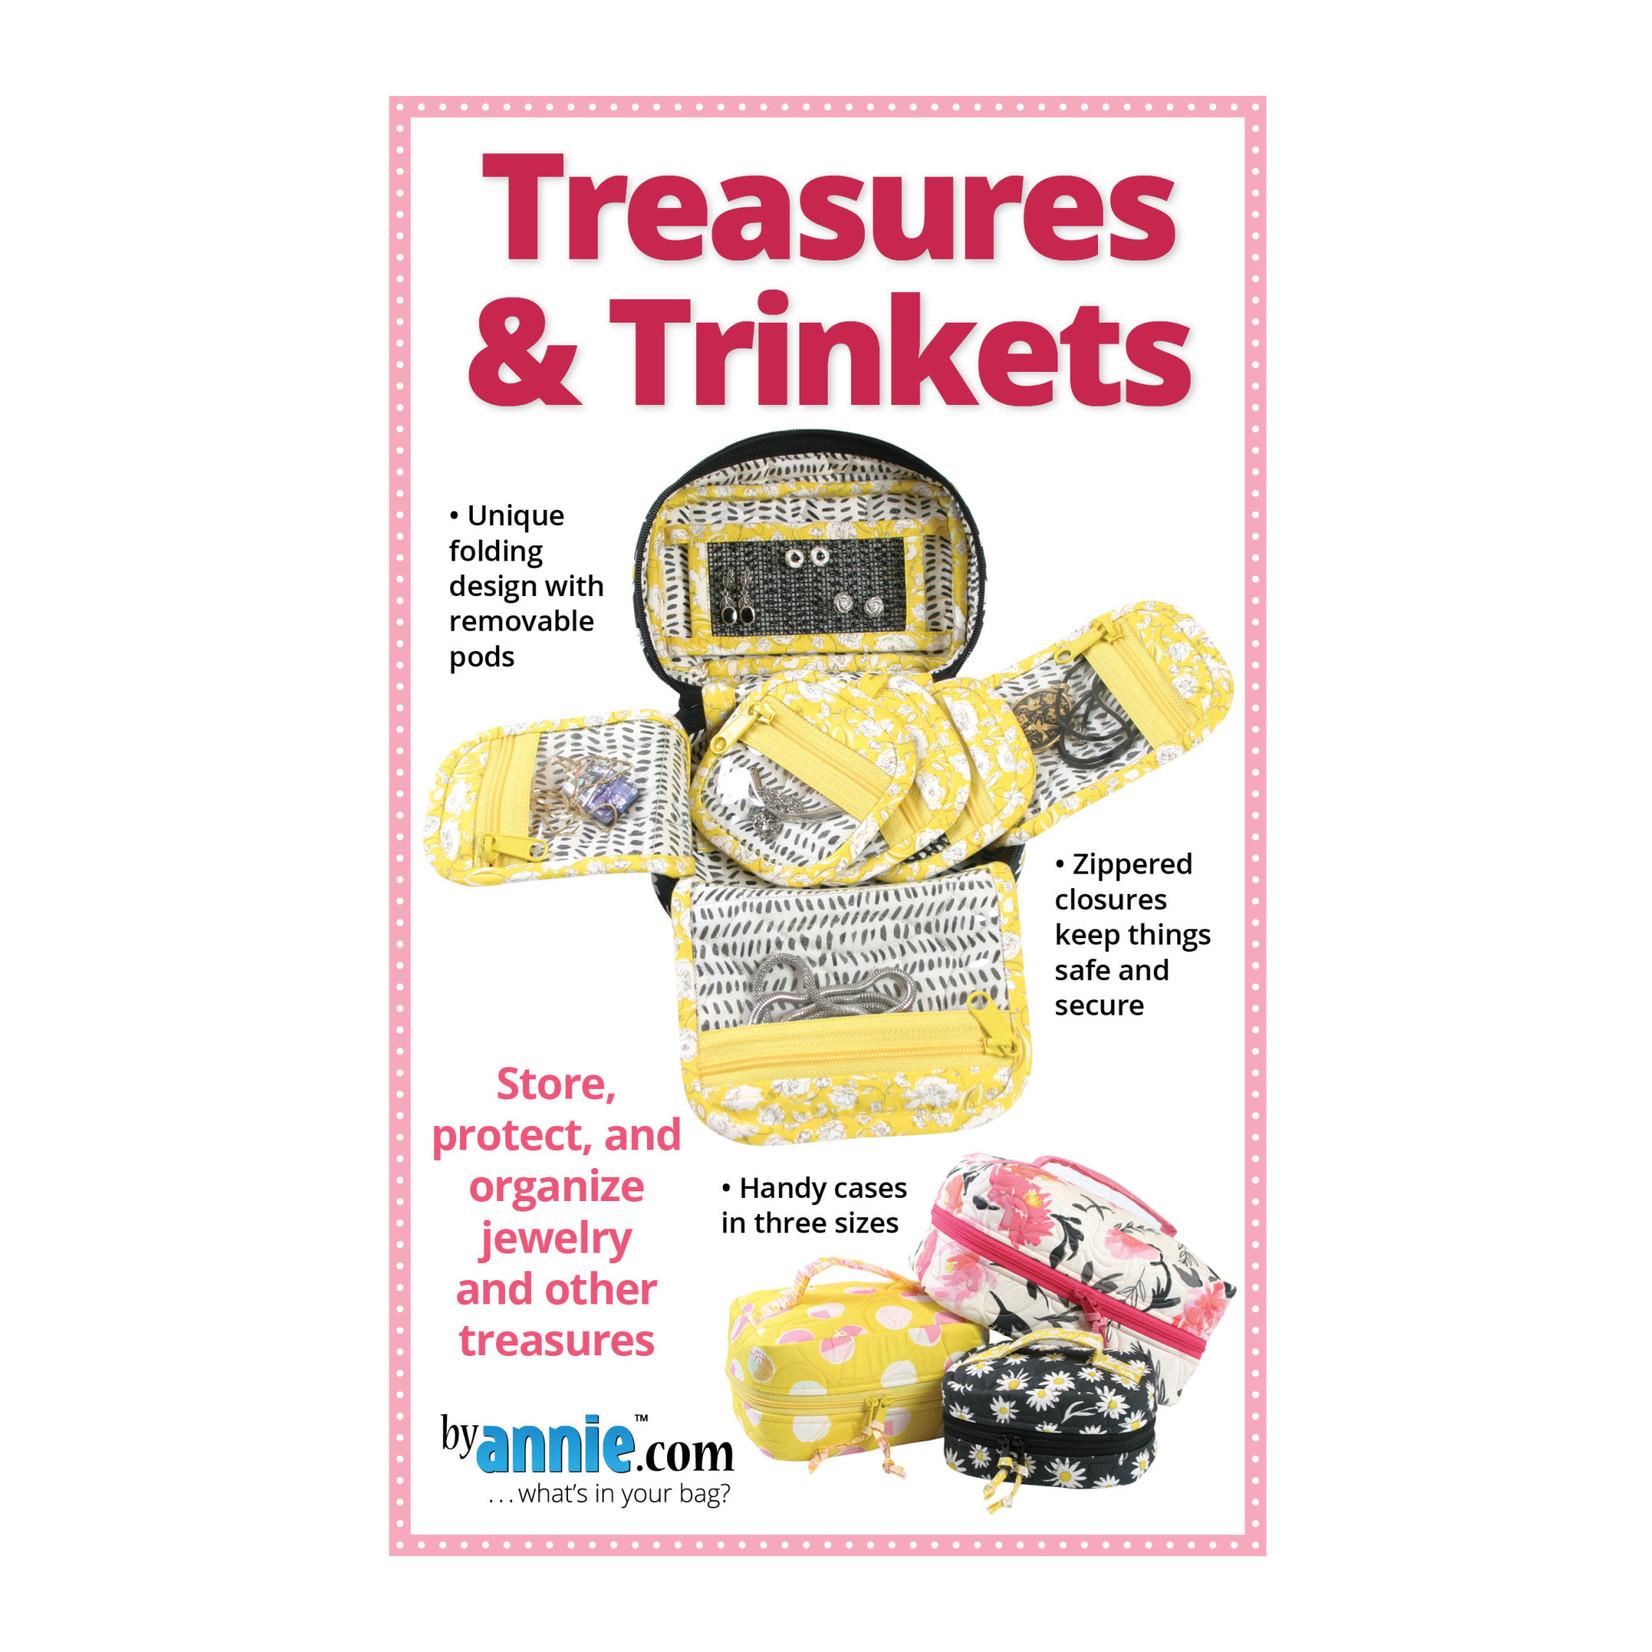 By Annie Treasures & Trinkets